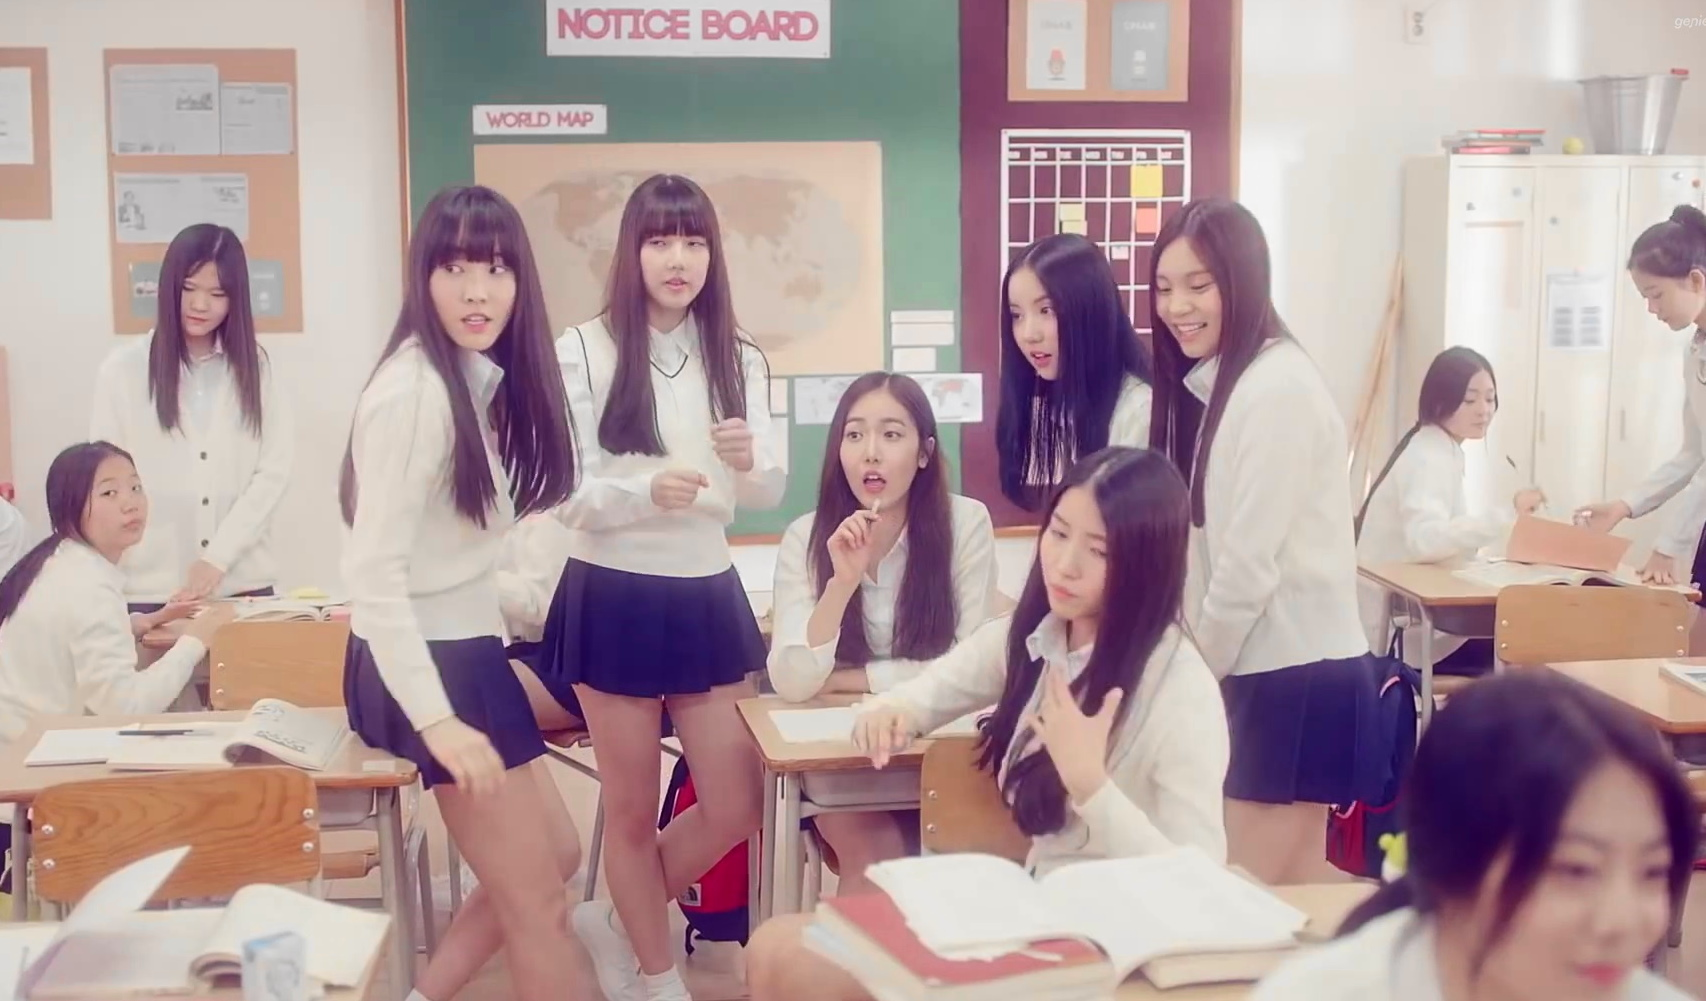 Cute Korean Girl Desktop Wallpaper Glass Bead By Gfriend Kpop Song Of The Week Modern Seoul